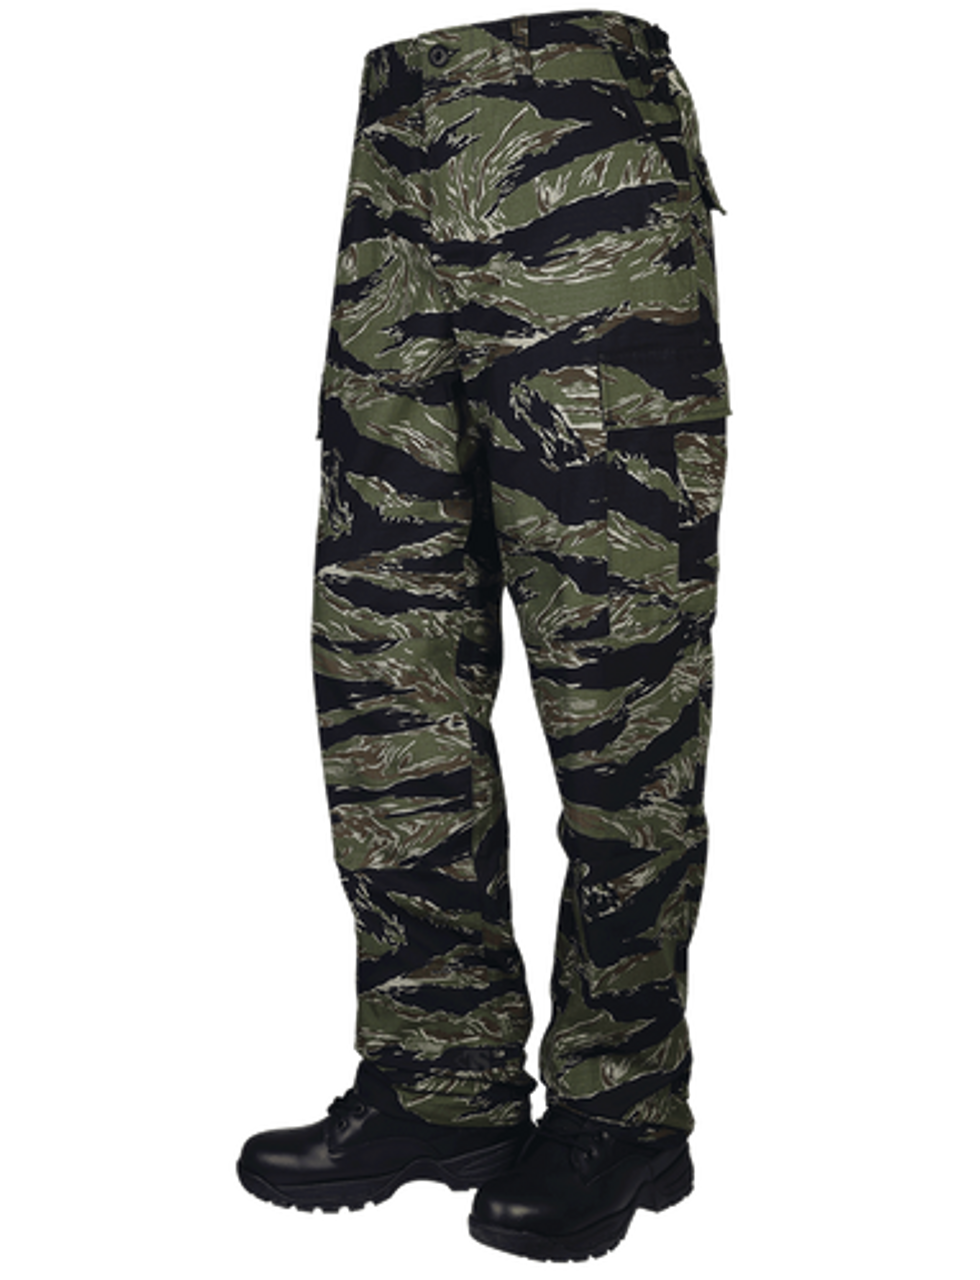 Tru-Spec 1593 Men's BDU Uniform Tactical Pants, Cargo, Relaxed Fit, 100% Cotton Rip-Stop, Nylon drawstring leg ties